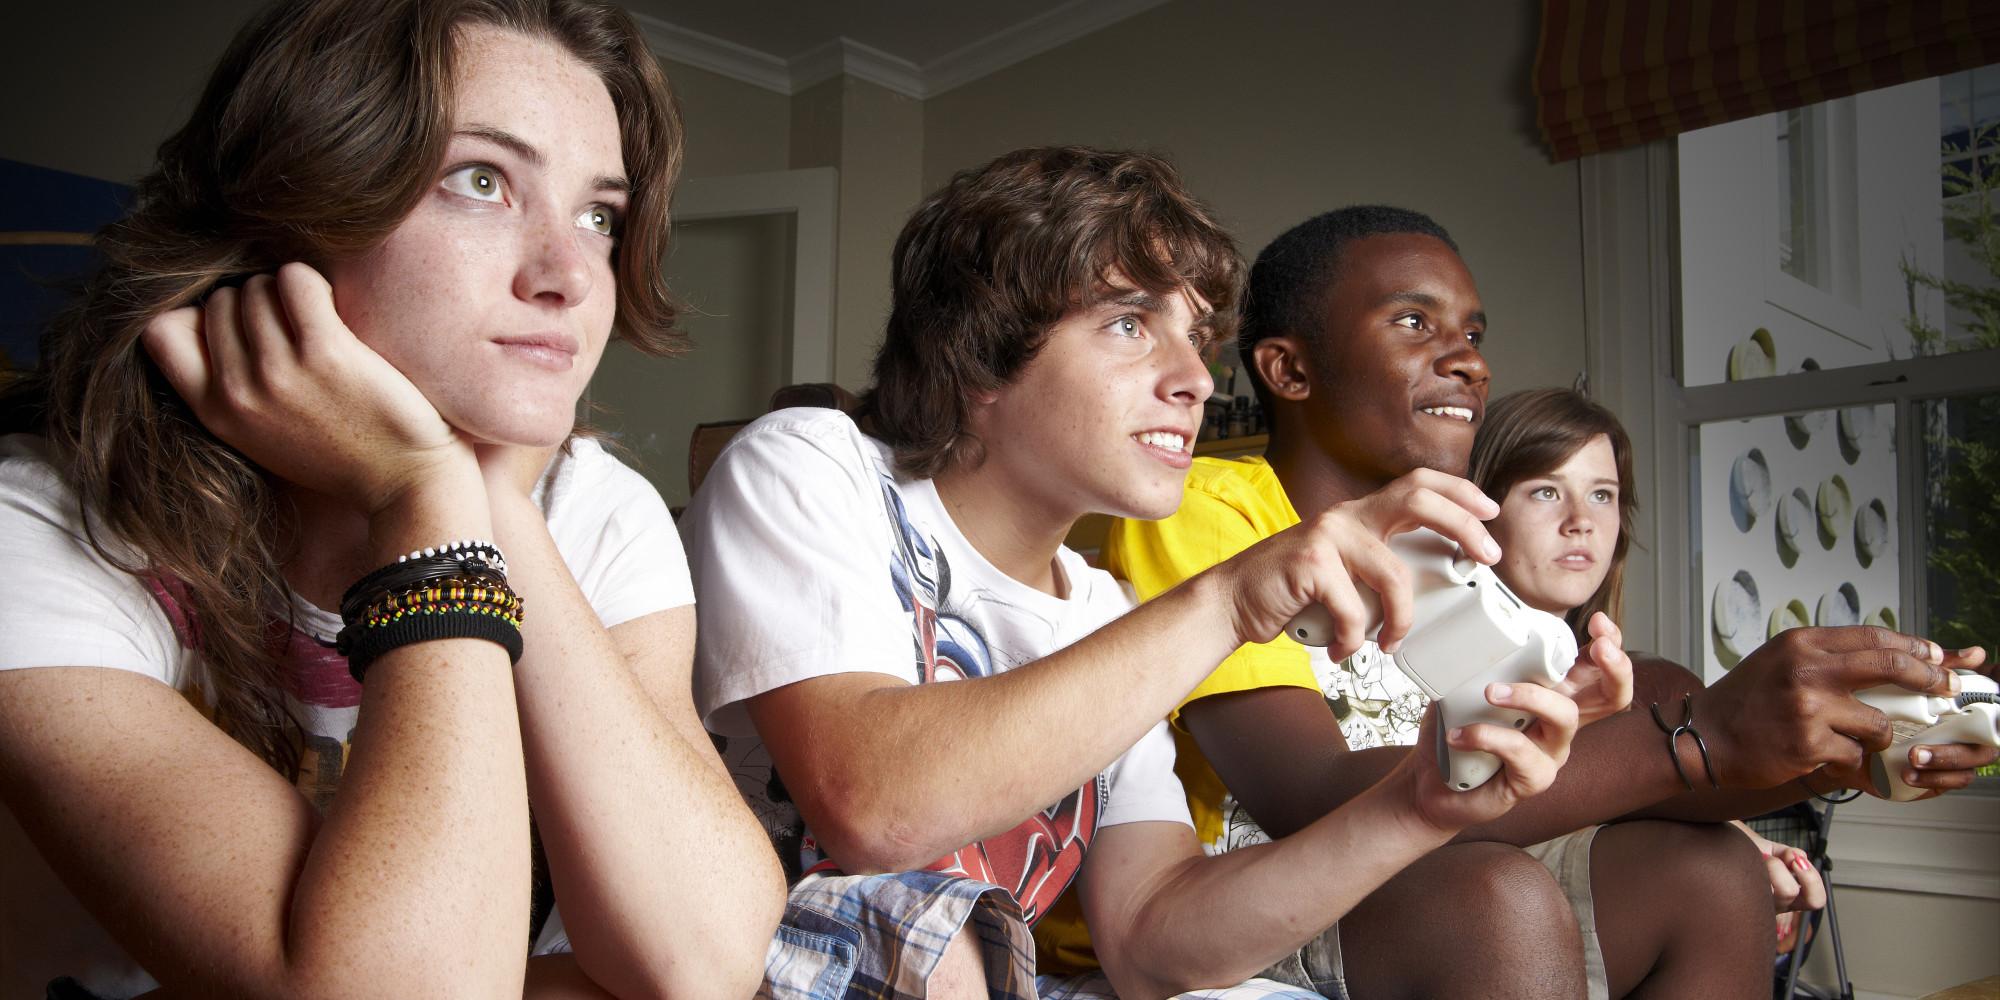 games teens video hurting